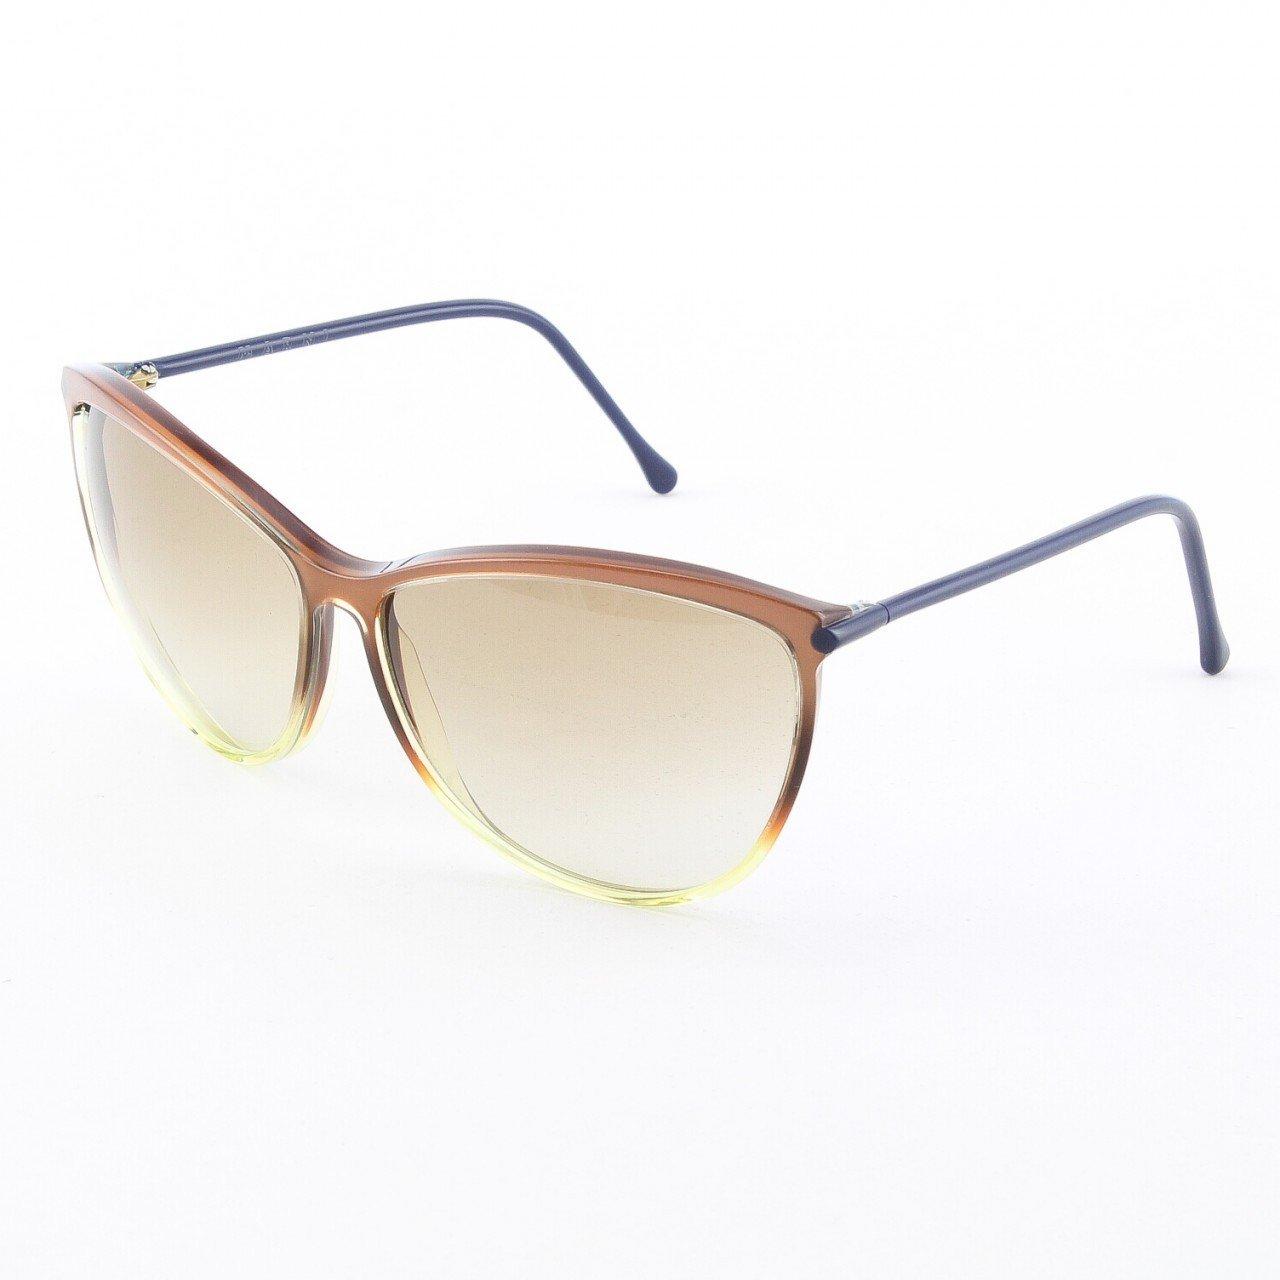 Marni MA183S Sunglasses 09 Translucent Copper, Navy Blue Accent, Gradient Lenses